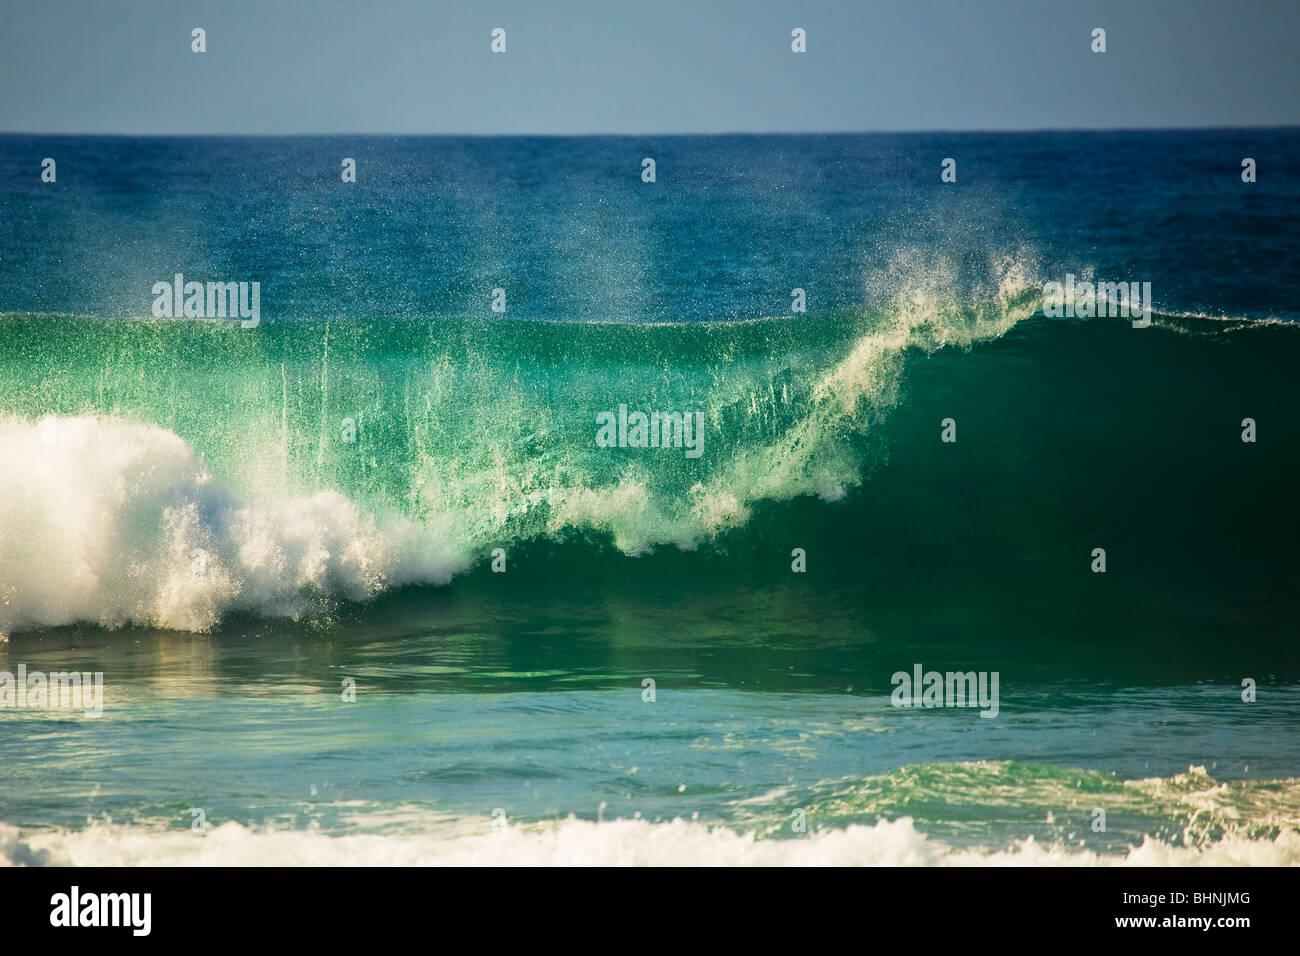 Breaking wave in green water at El lloret in Gran Canaria - Stock Image